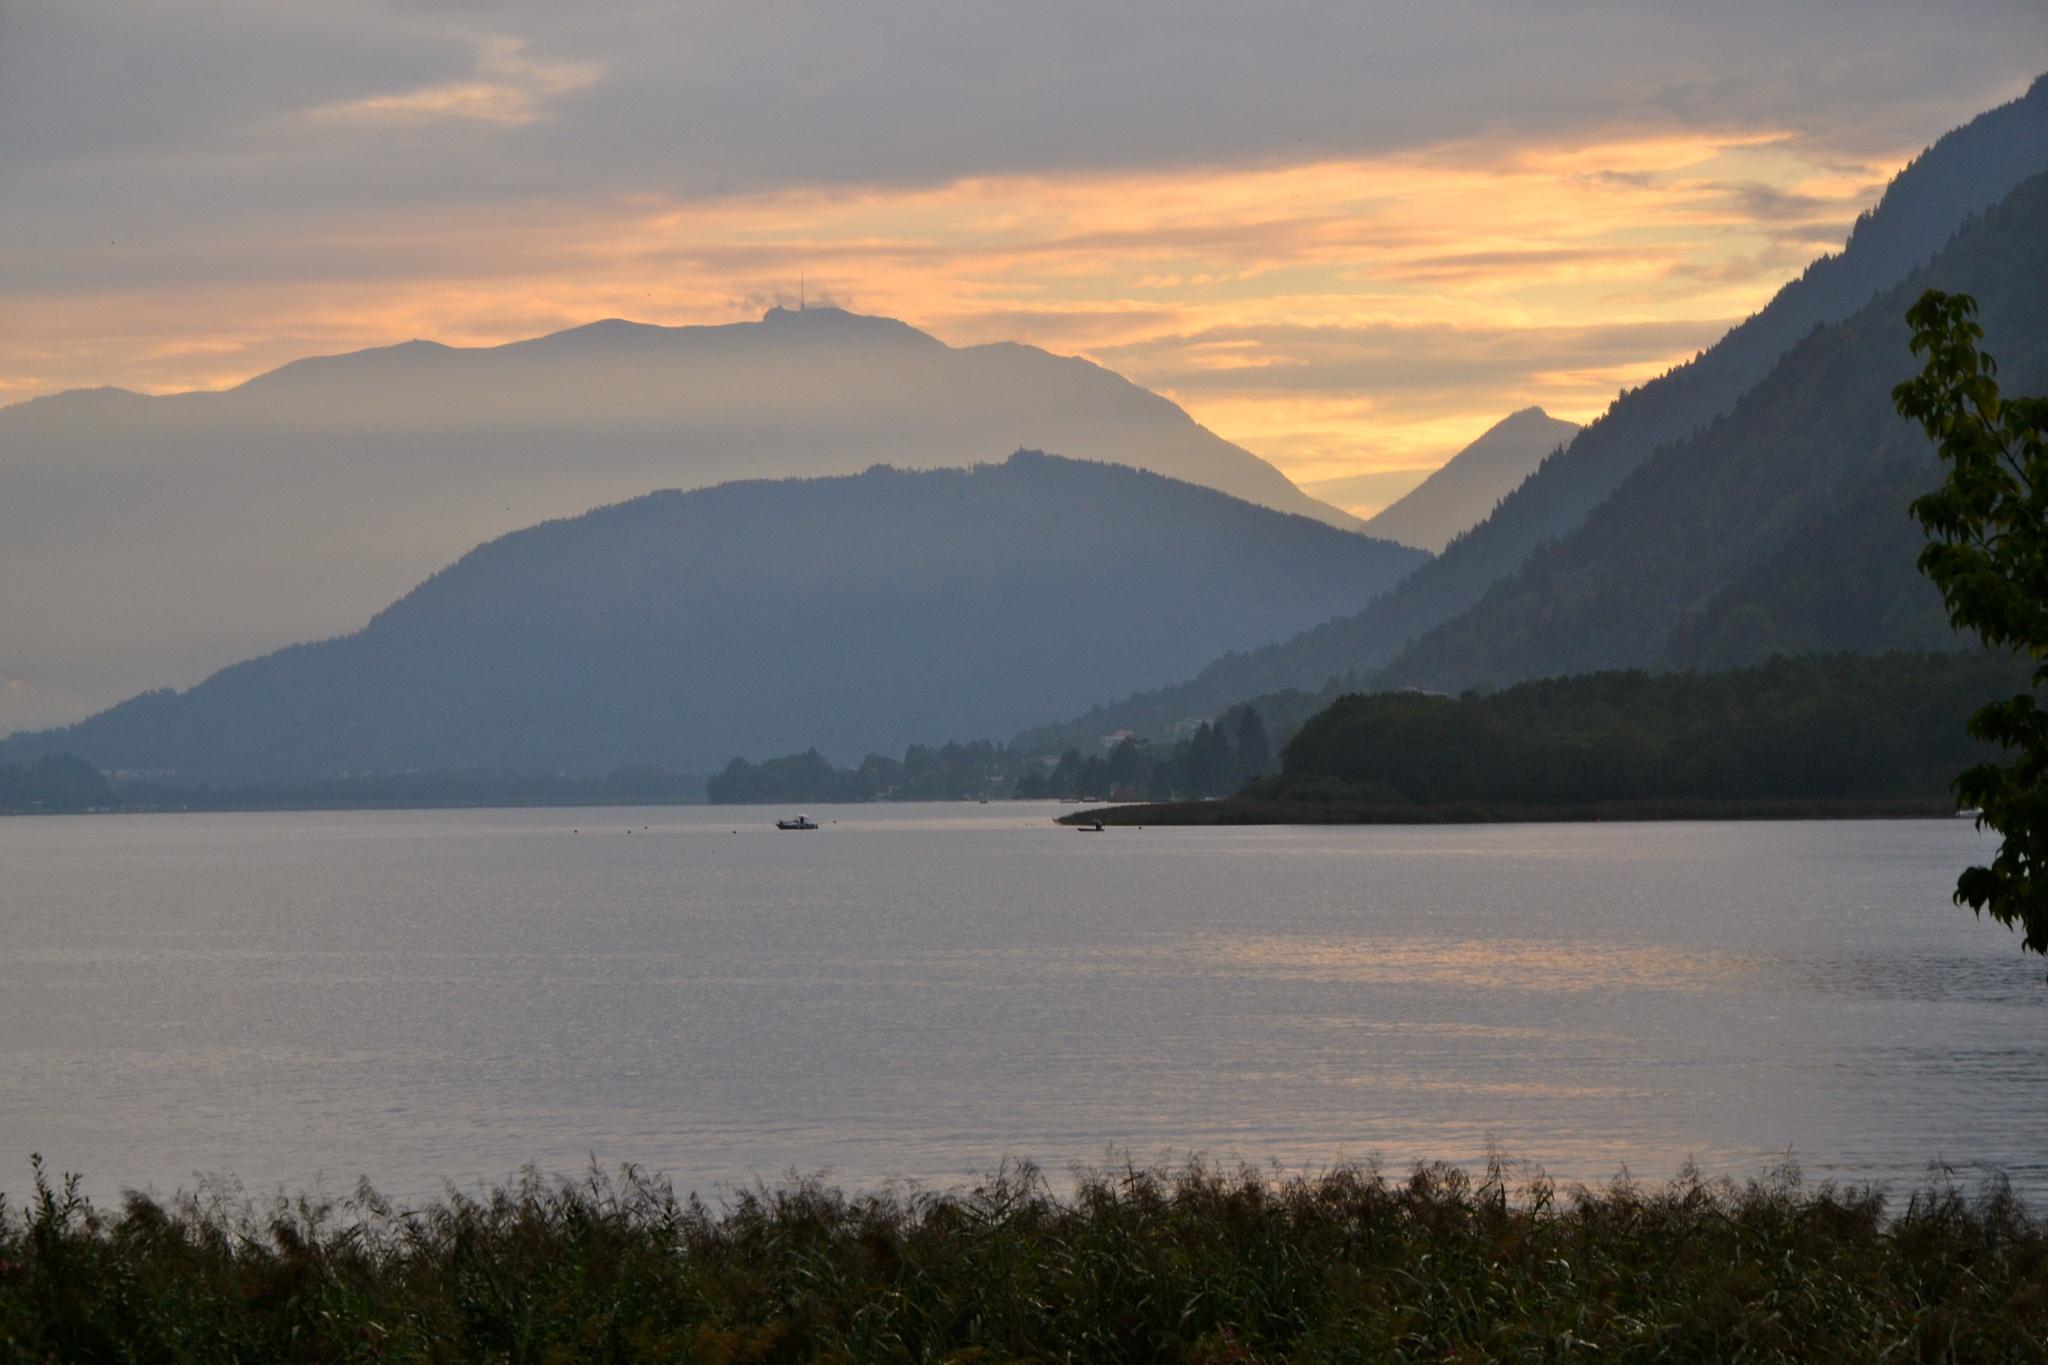 Evening on the Ossiach lake in Carinthia, Austria by echumachenco